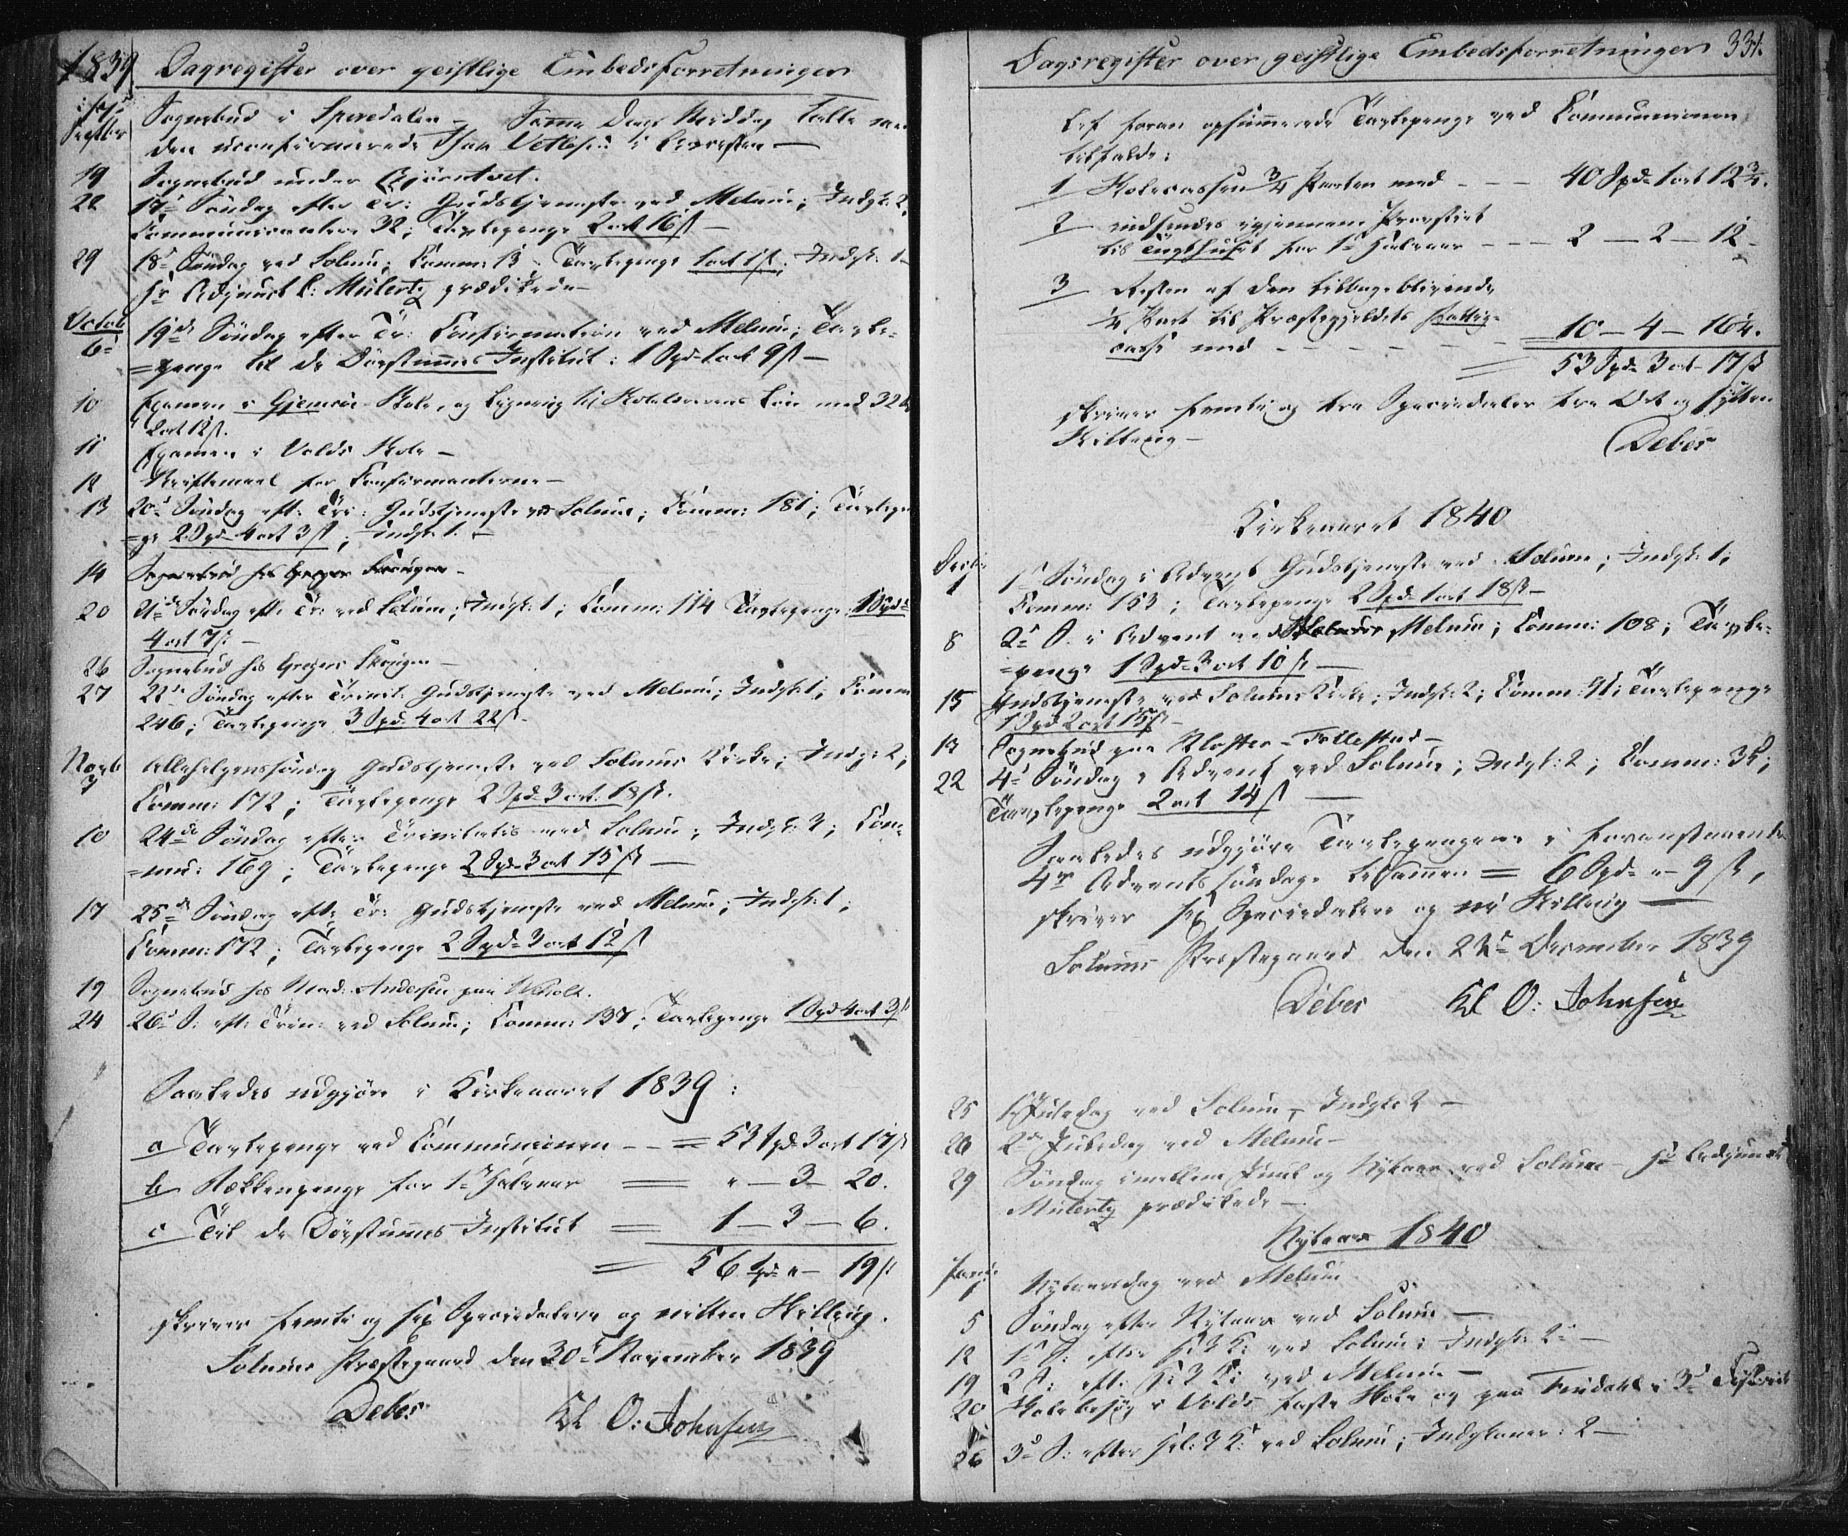 SAKO, Solum kirkebøker, F/Fa/L0005: Ministerialbok nr. I 5, 1833-1843, s. 331